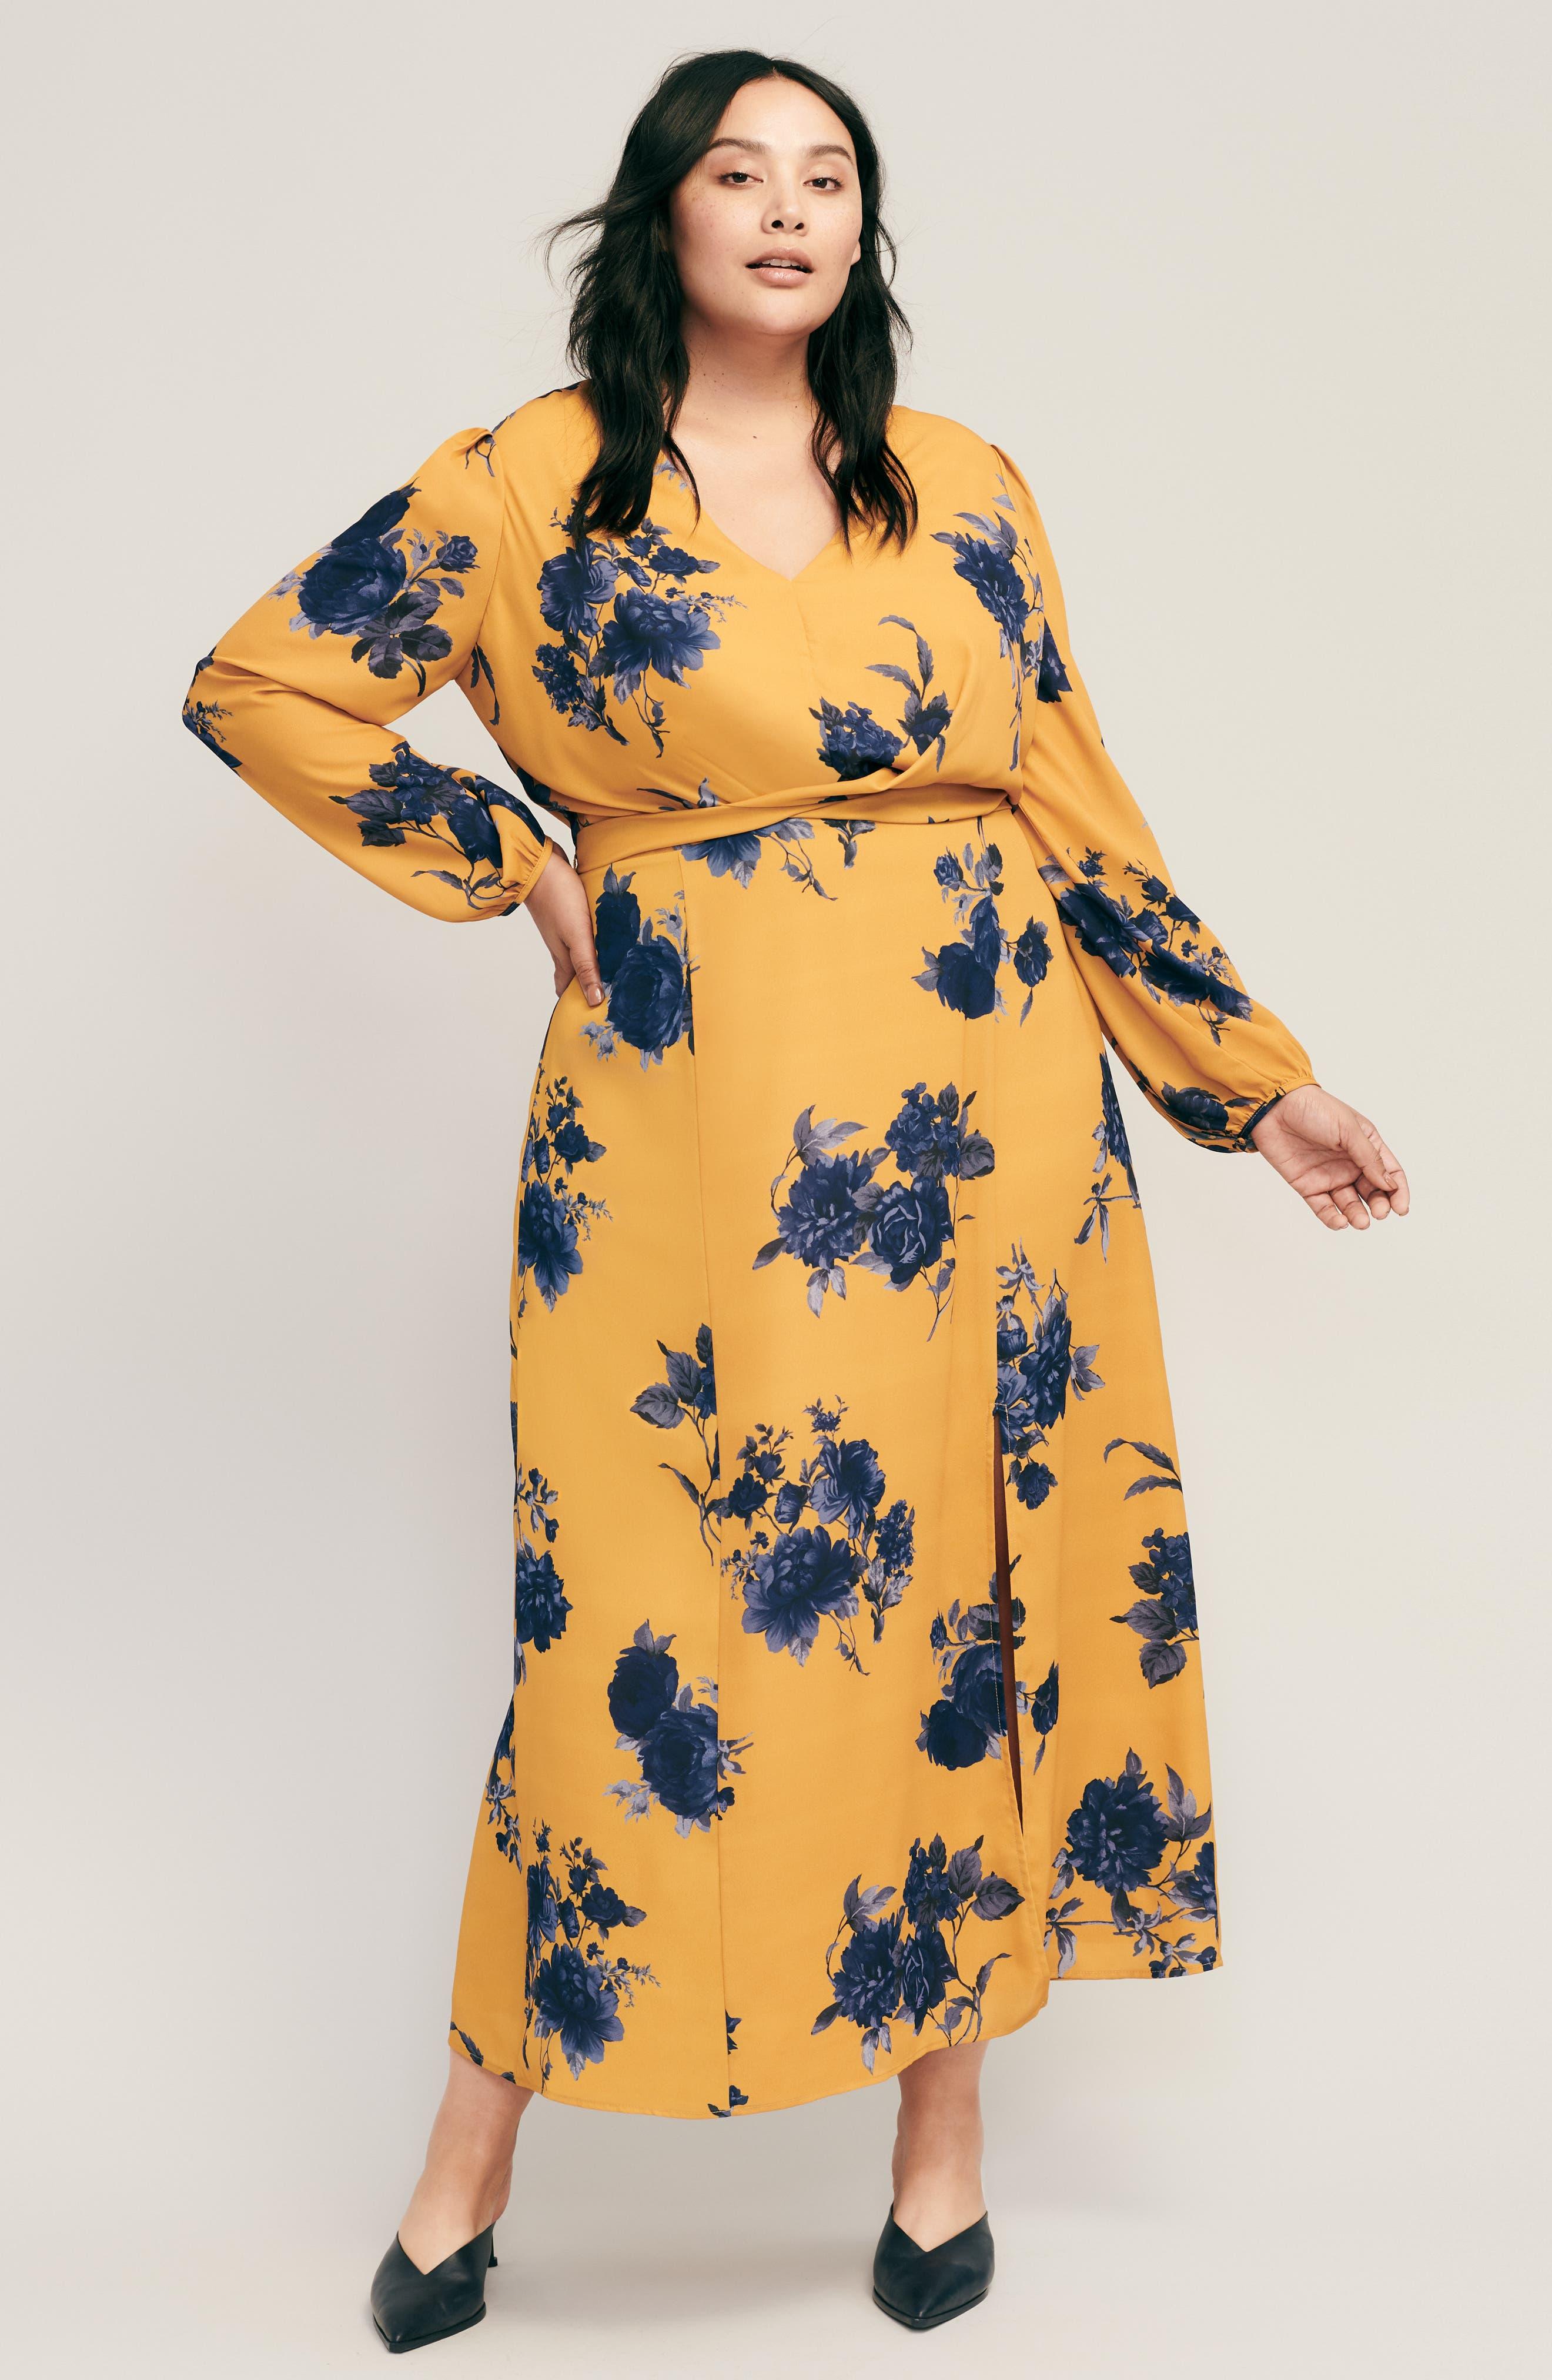 CHELSEA28,                             Floral Print Faux Wrap Maxi Dress,                             Alternate thumbnail 8, color,                             YELLOW NAVY